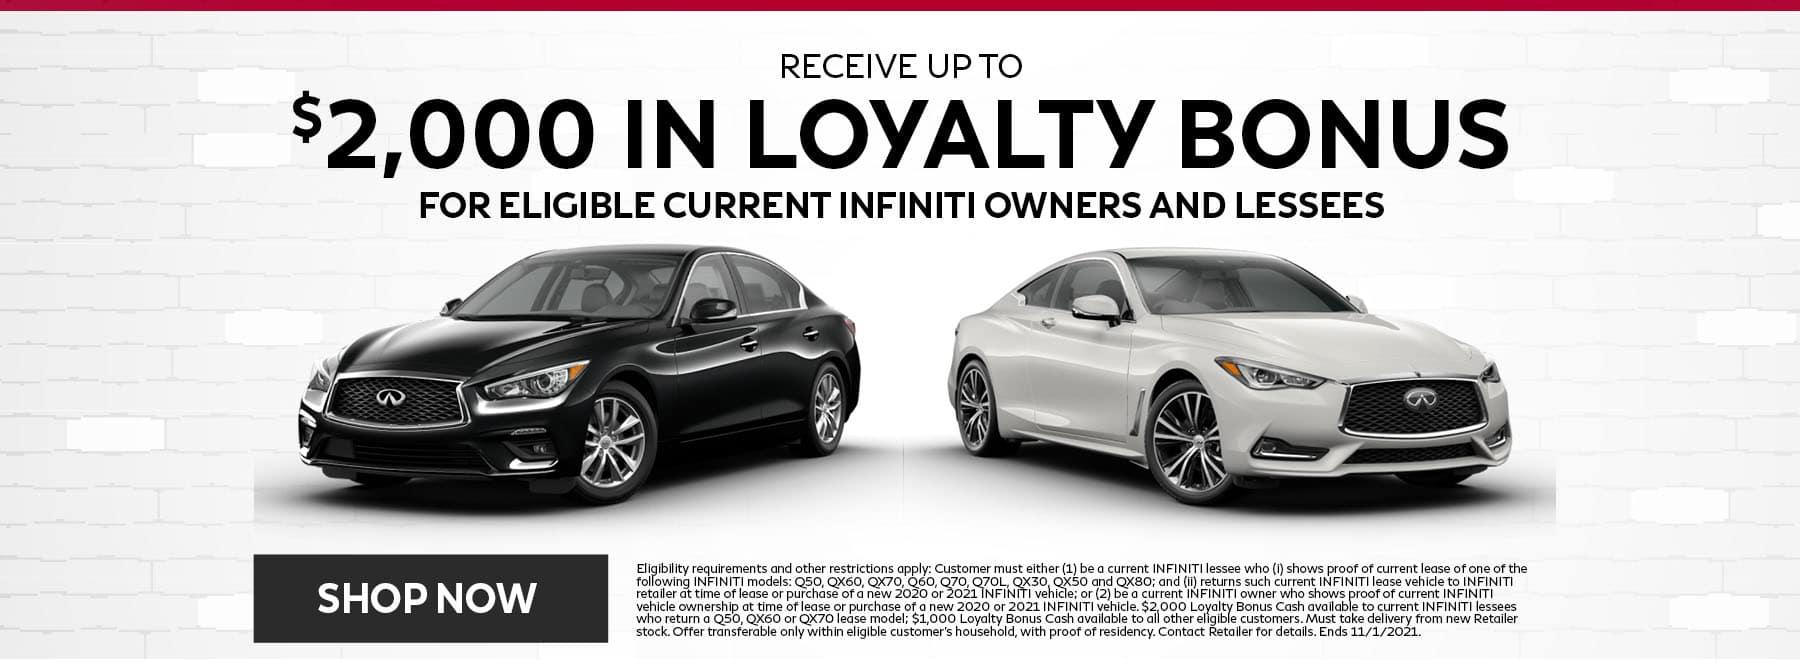 Loyalty Bonus Offer